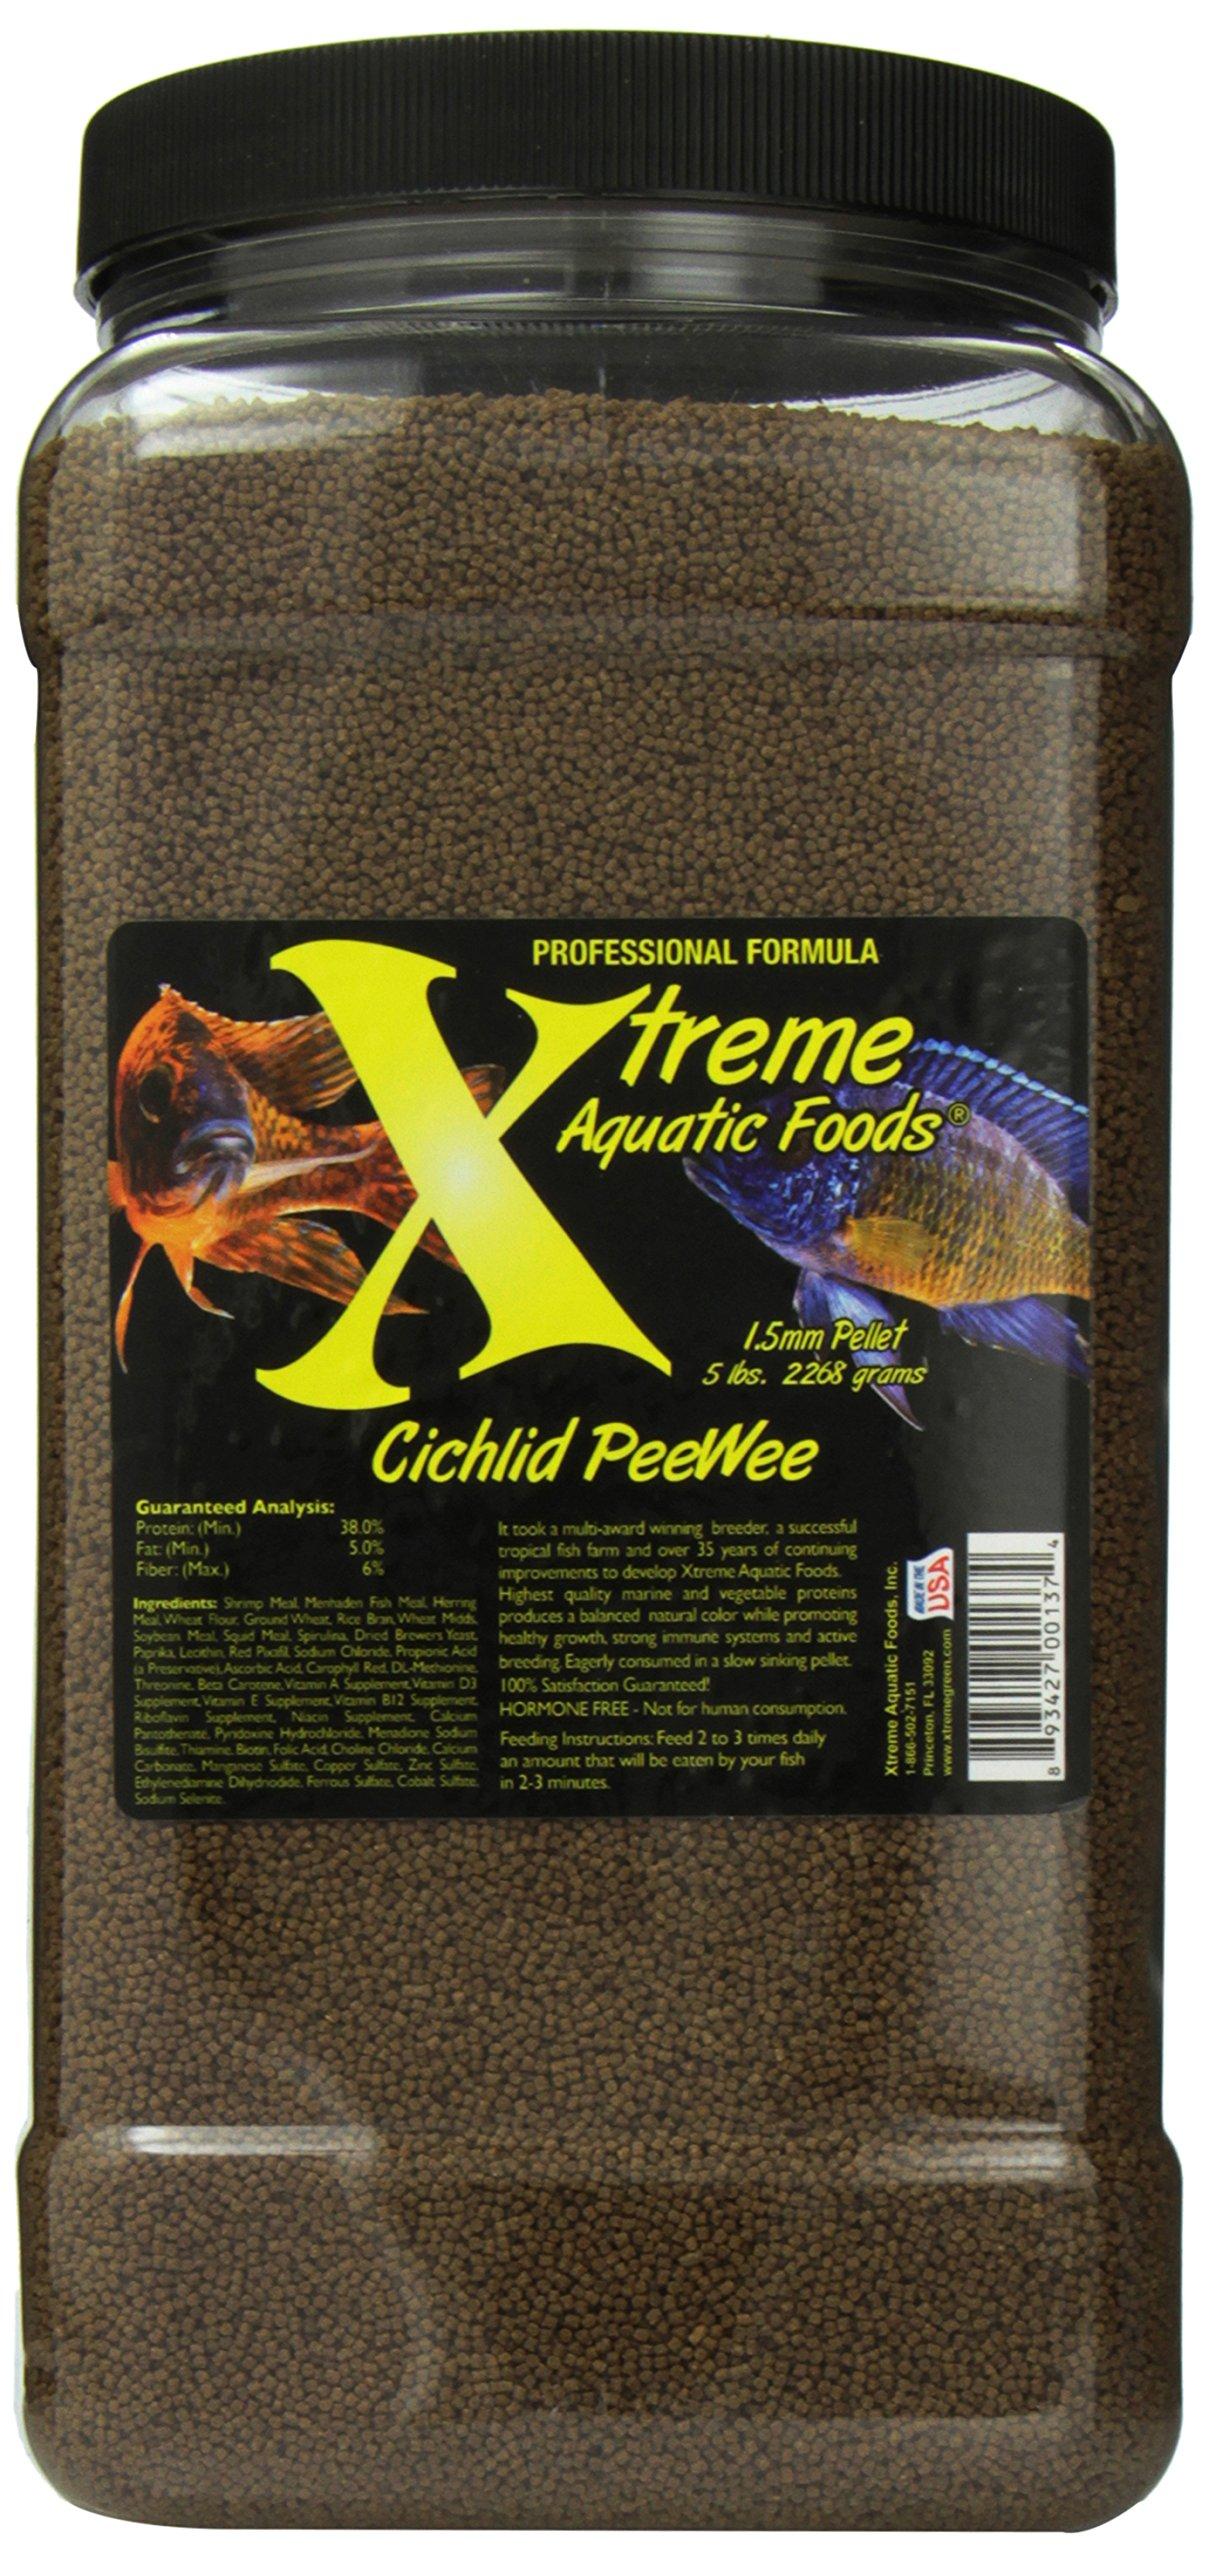 Xtreme Aquatic Foods 2137-G Cichlid Pee-Wee Fish Food by Xtreme Aquatic Foods (Image #1)